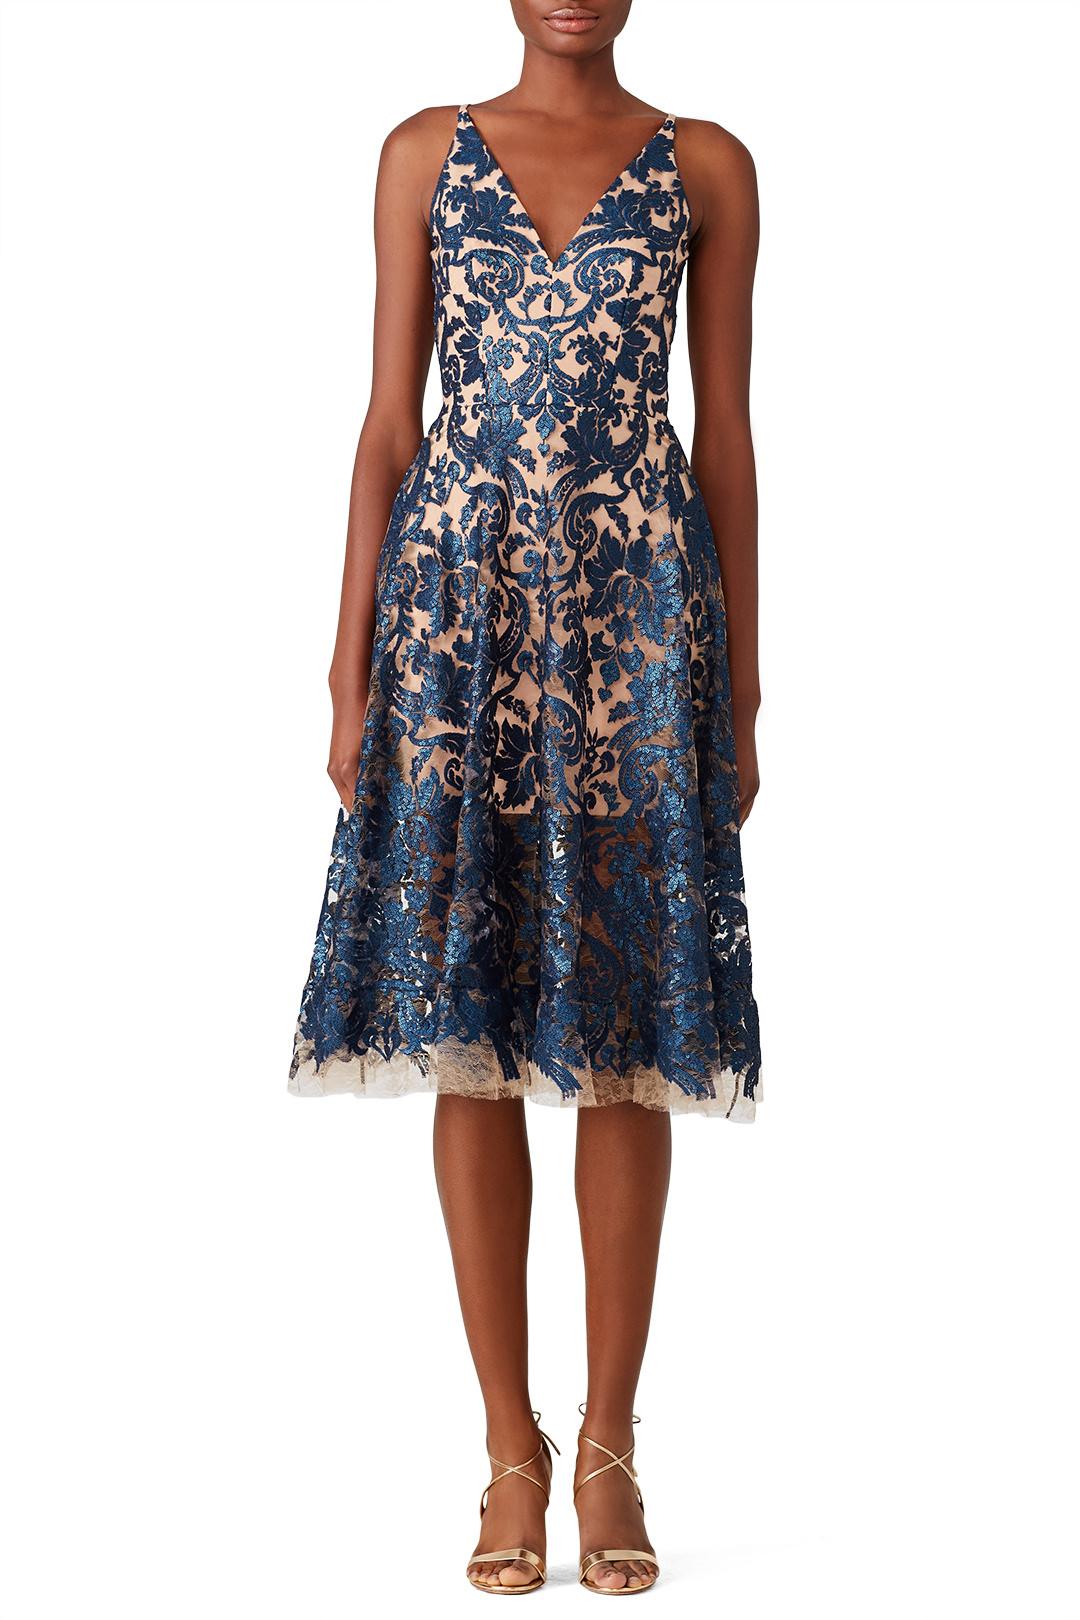 Dress the Population Blair Sequin Lace Dress - $40.00-$50.00